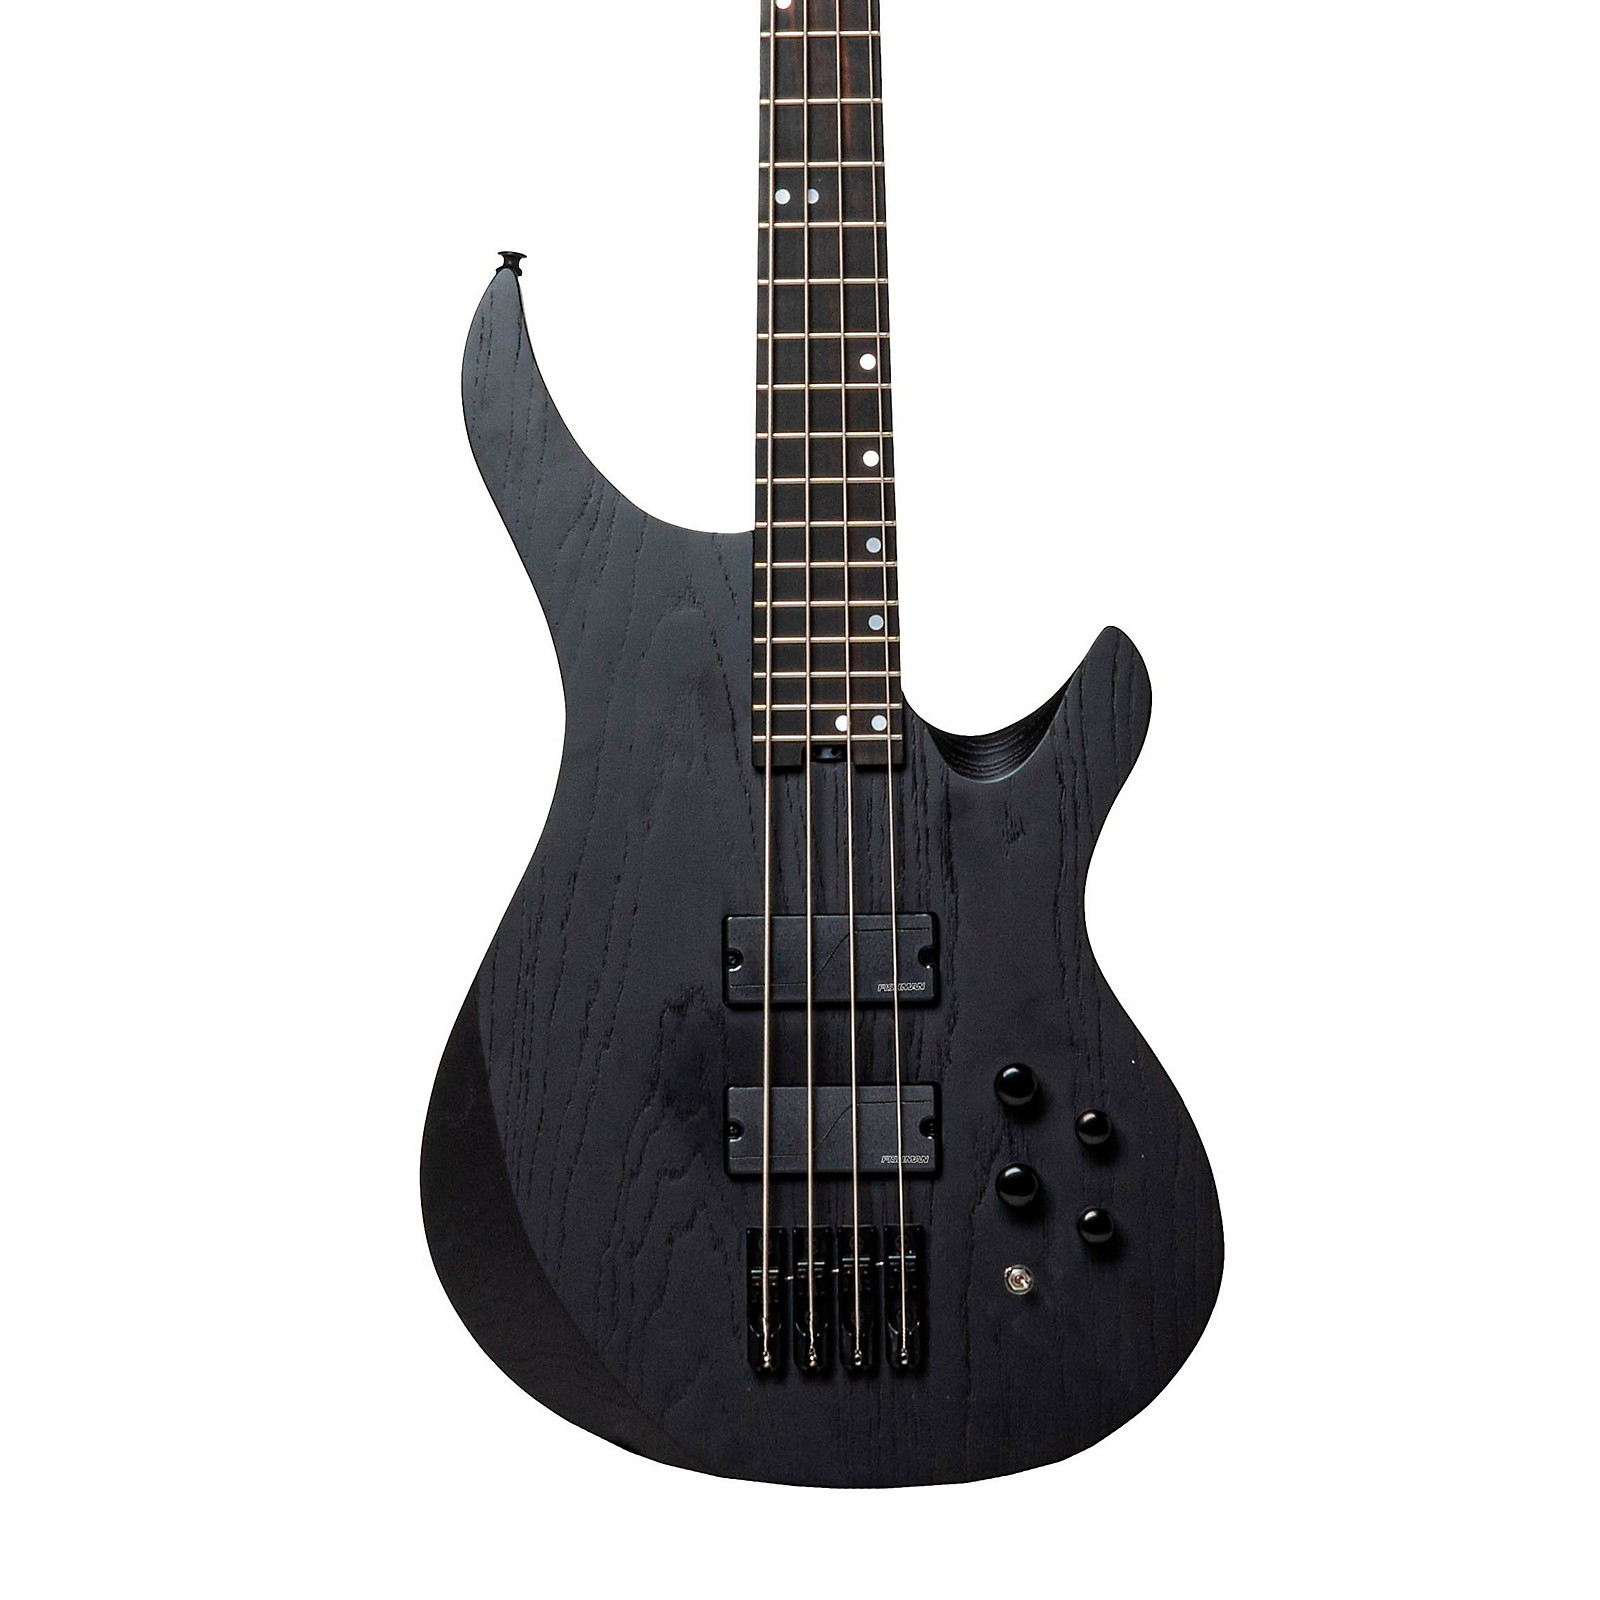 Legator NB4 Ninja Bass